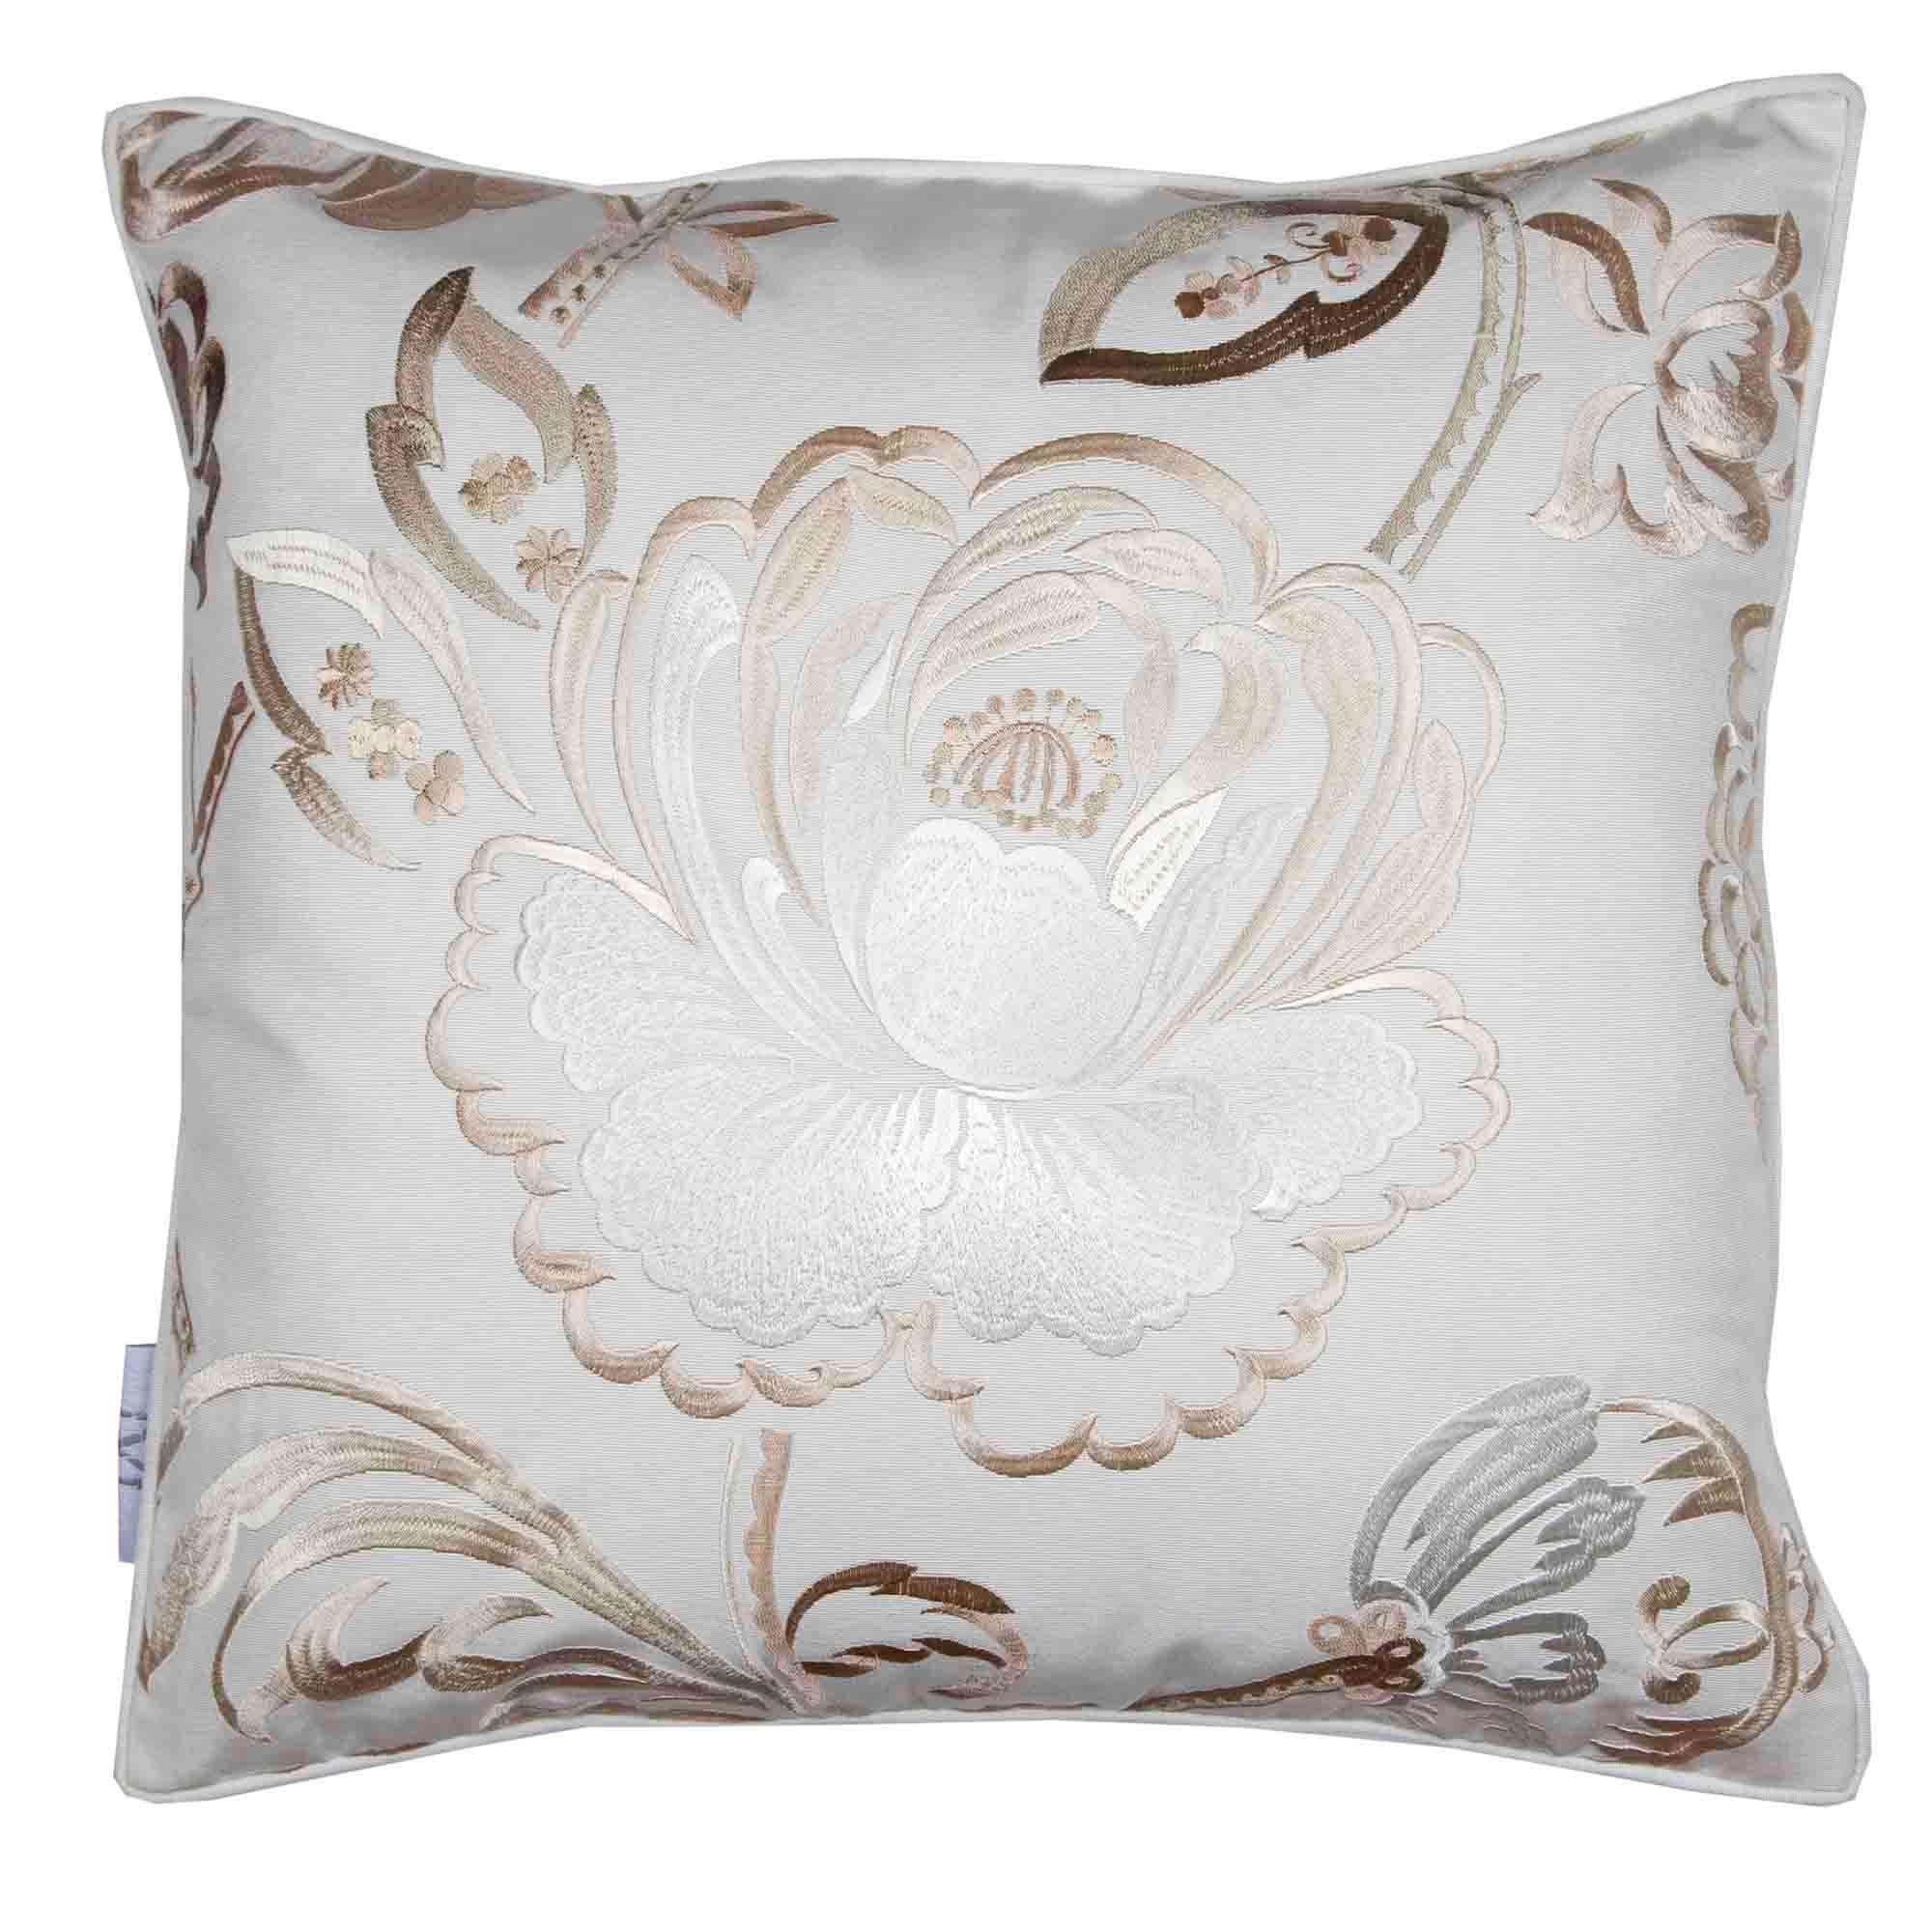 Madura Decorative Pillow - Throw Pillow cover Magellan 16X16 Offwhite